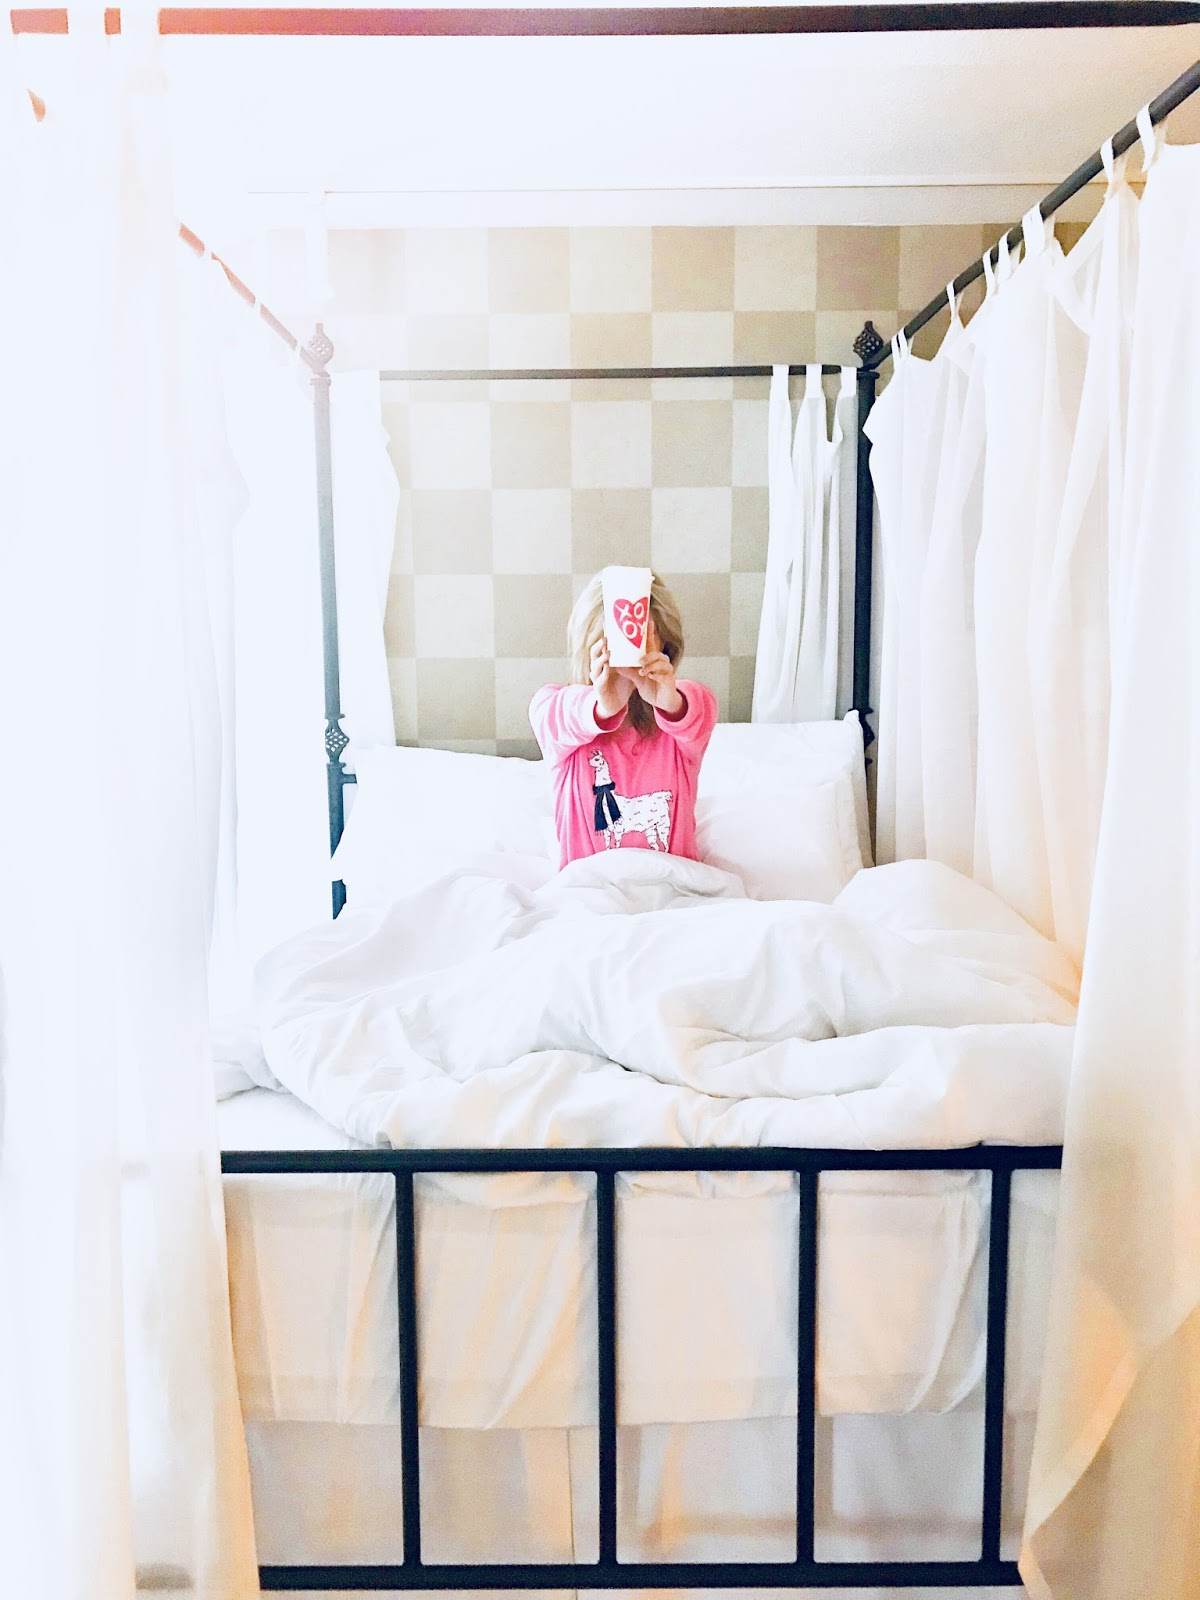 Bijuleni | How To Unwind at White Oaks Resort & Spa, Niagara on the Lake | Girls Weekend Getaway